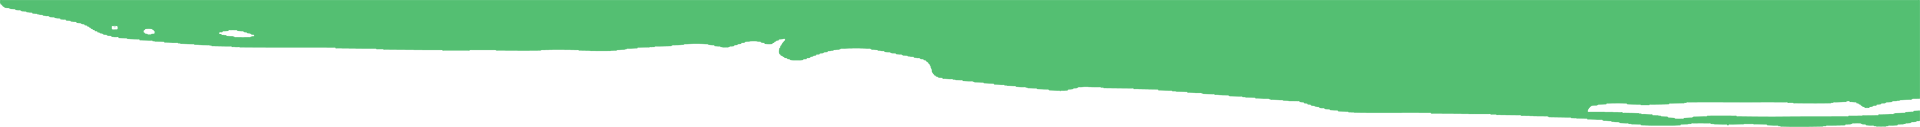 sep-green-bottom